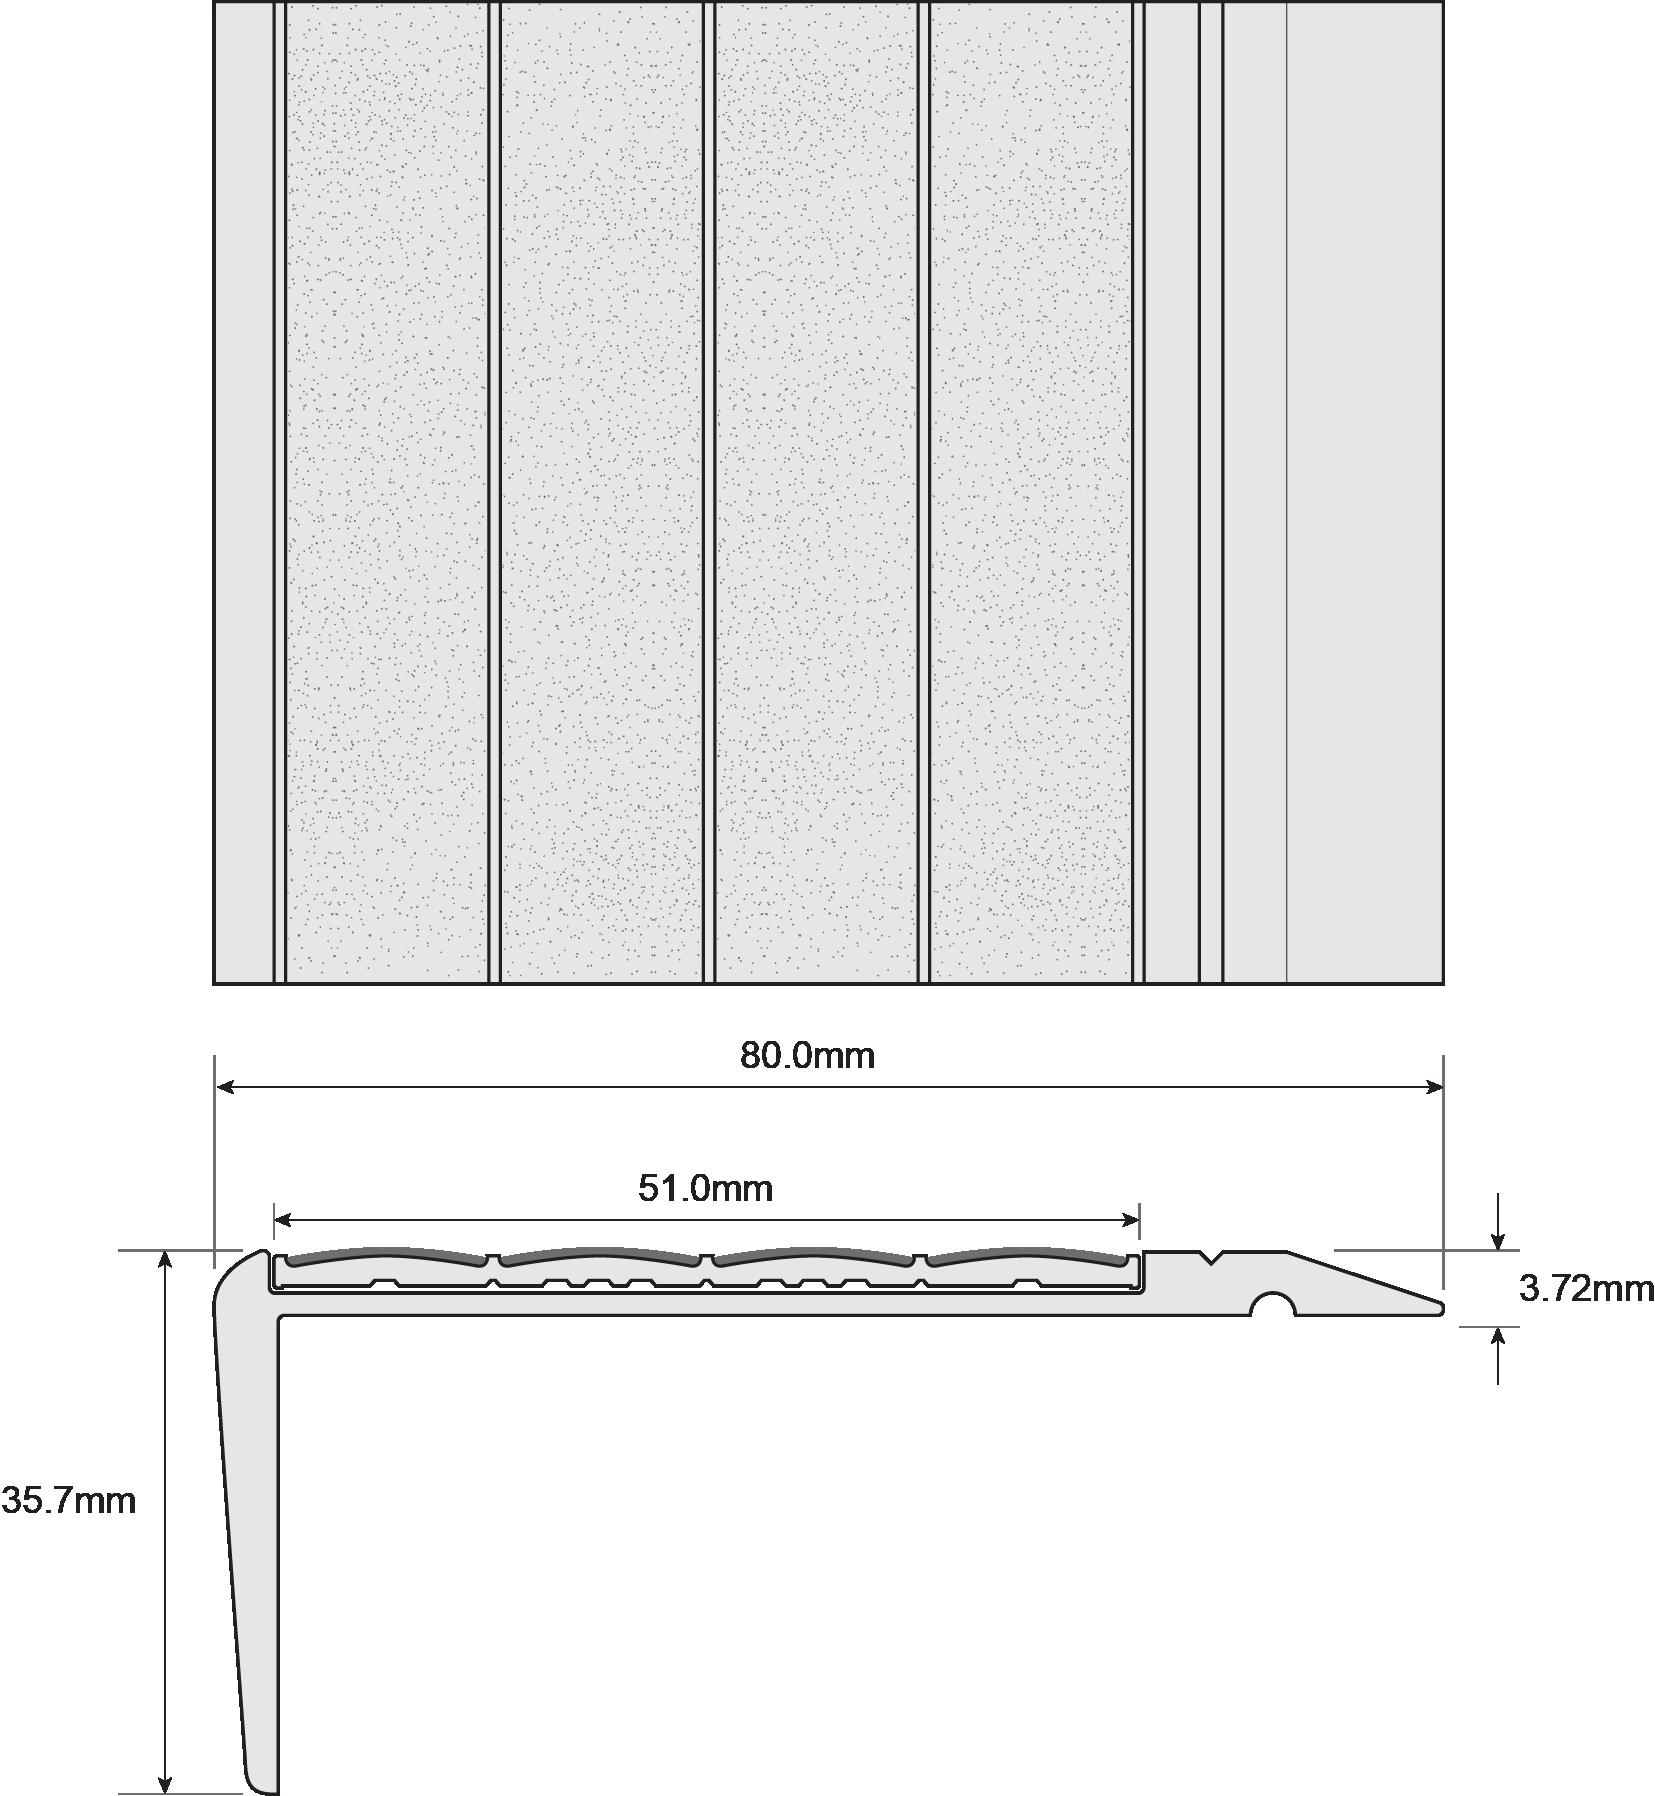 ESP Stair Nosing 35.7x80mm F430130 TITANIA Techincal Drawing